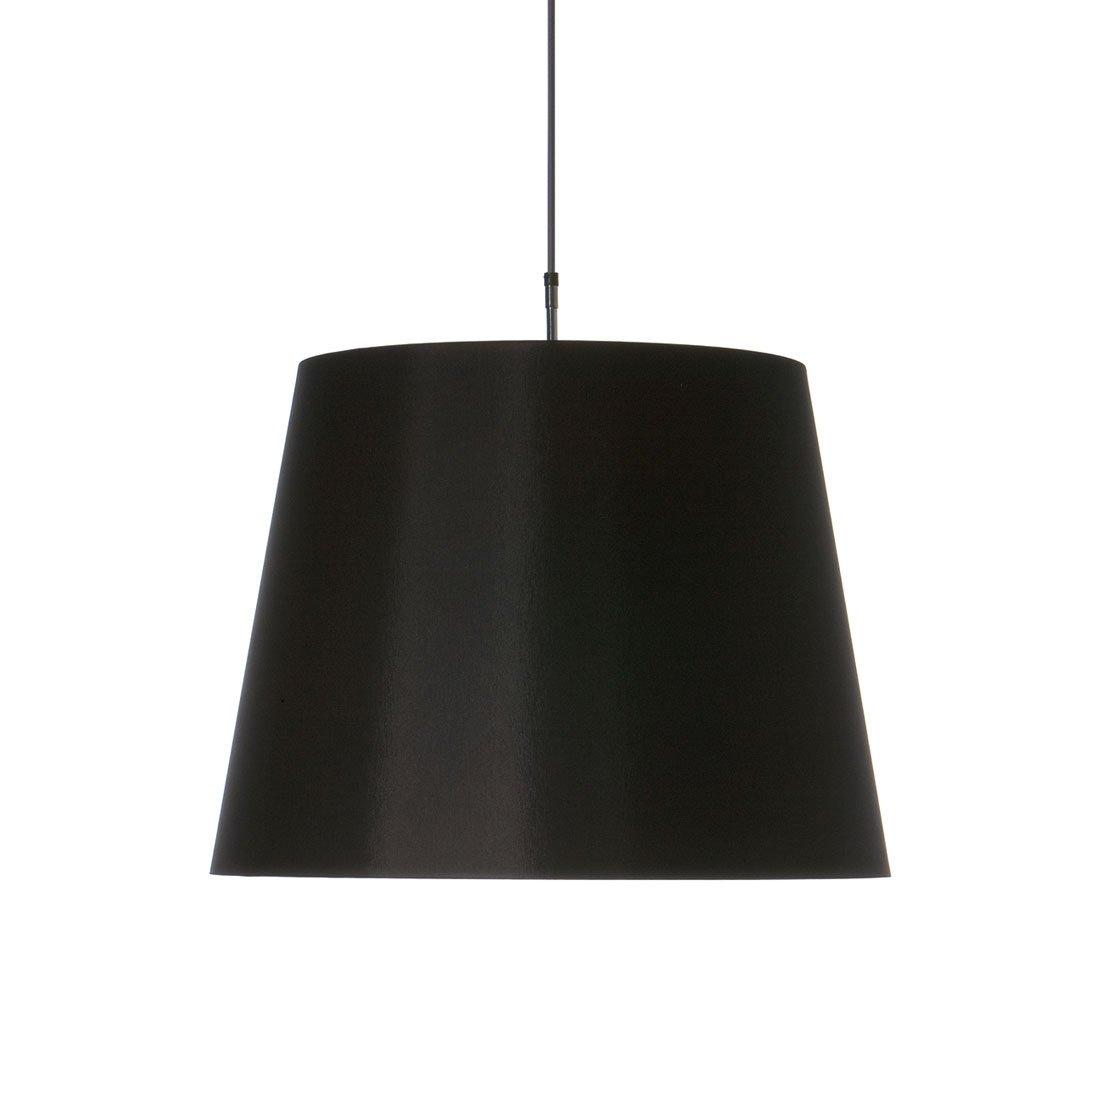 Moooi Hang Hanglamp Zwart